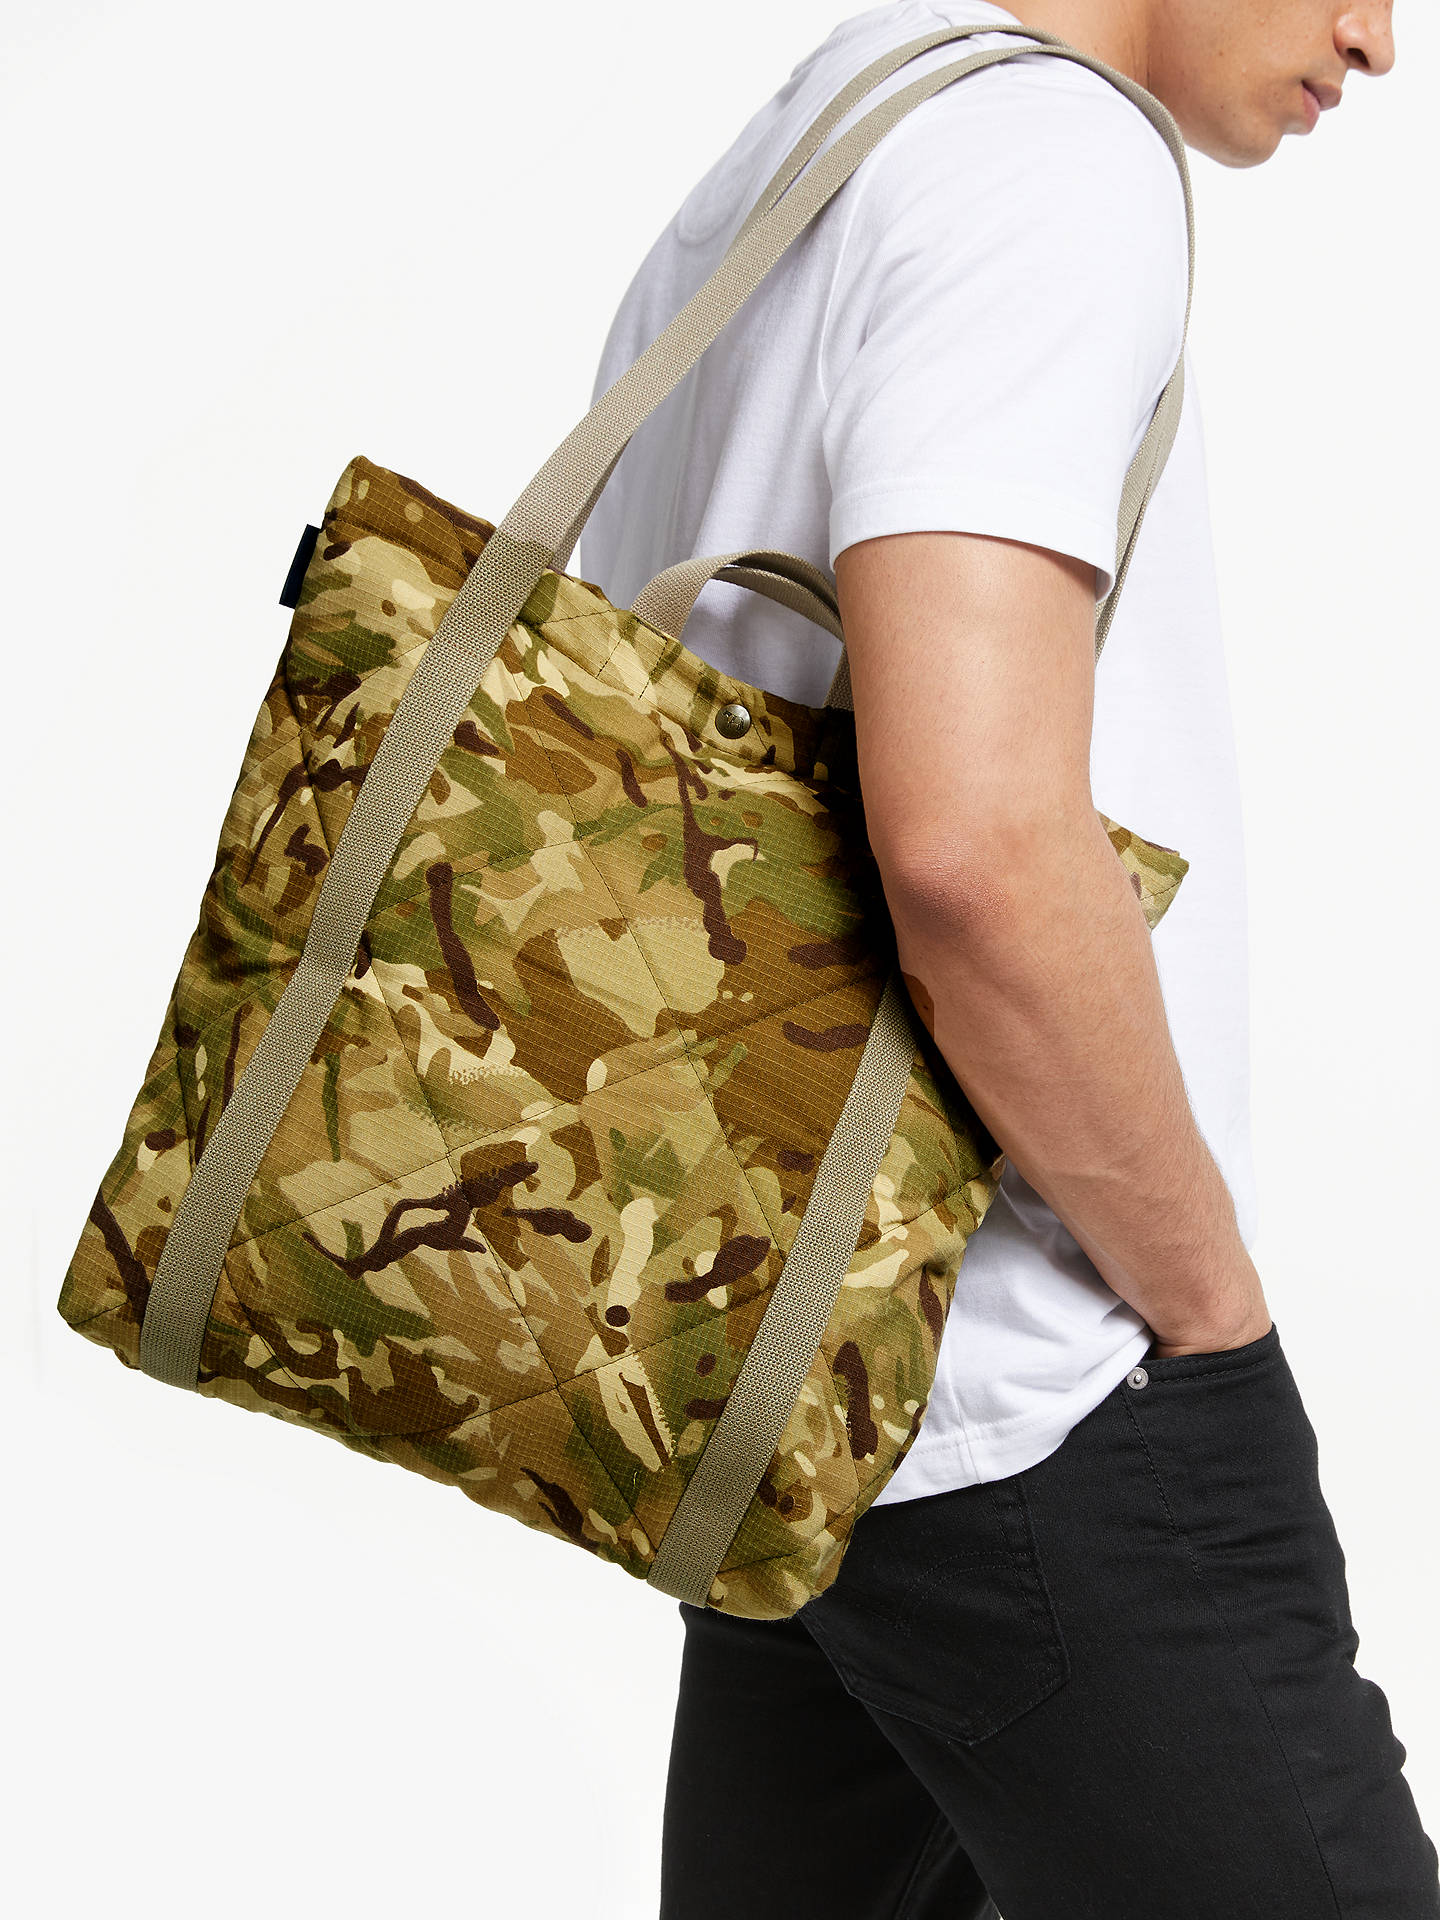 premium urval stor rabatt nytt koncept Fred Perry Lavenham Hintlesham Tote Bag, Camo at John Lewis & Partners